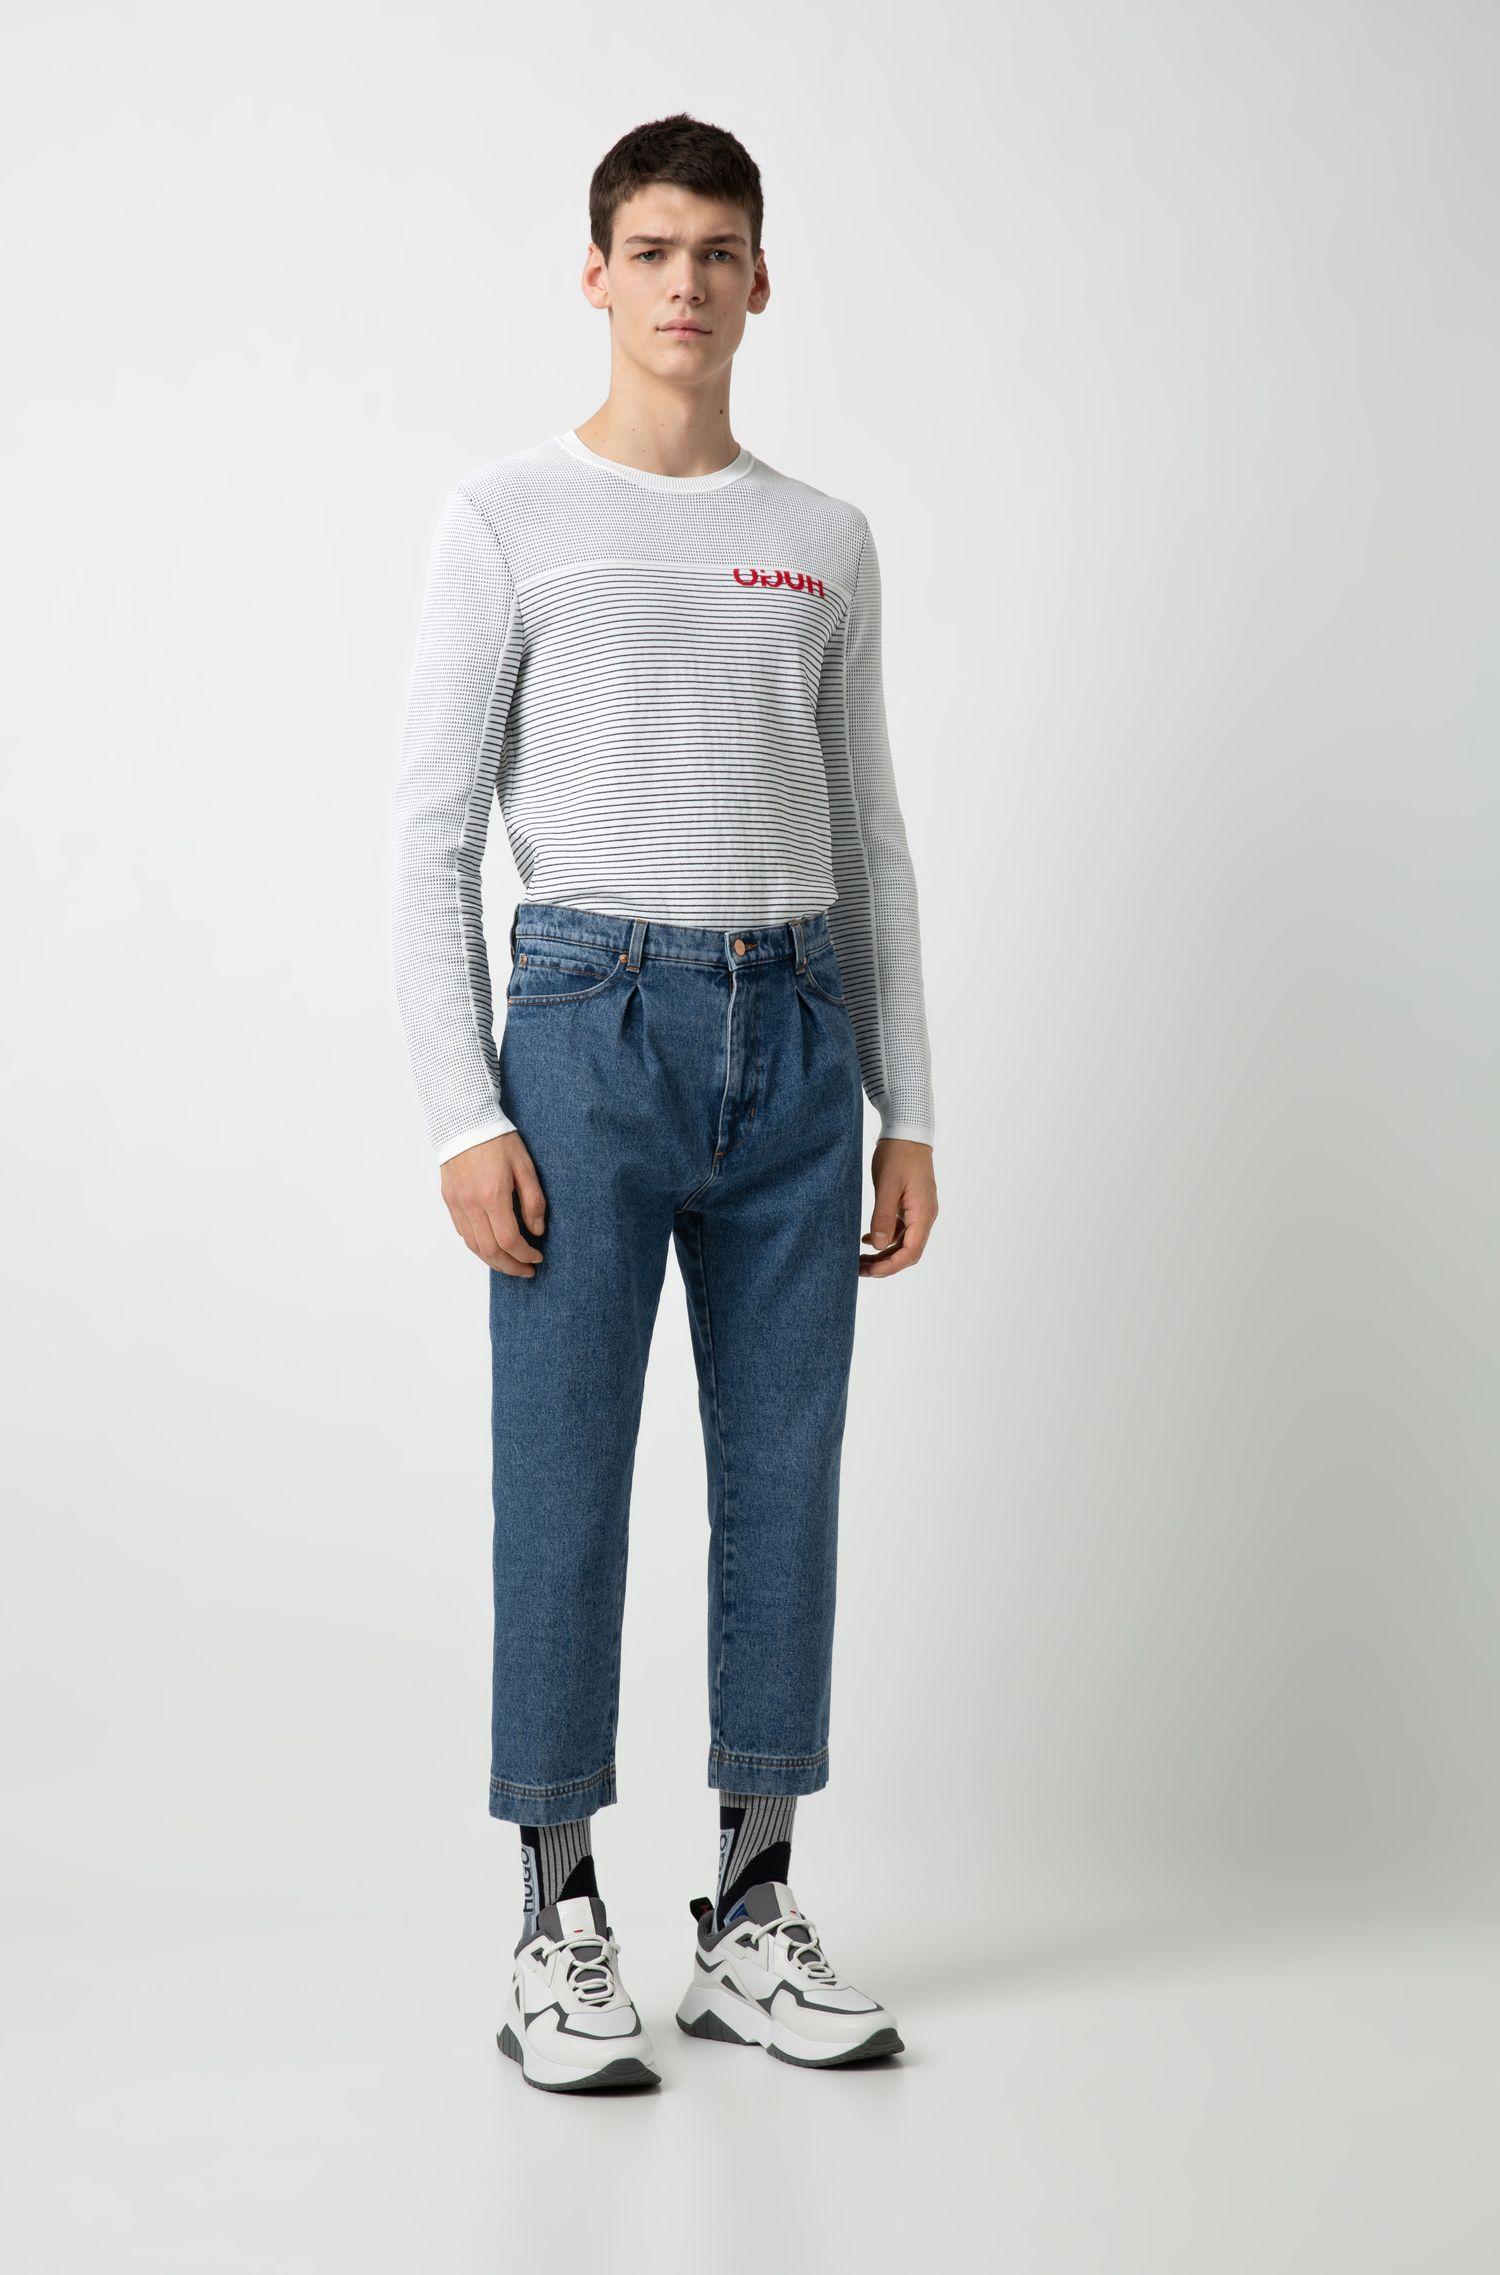 Hugo Boss - Relaxed-Fit Jeans in Cropped-Länge mit Bundfalten - 2